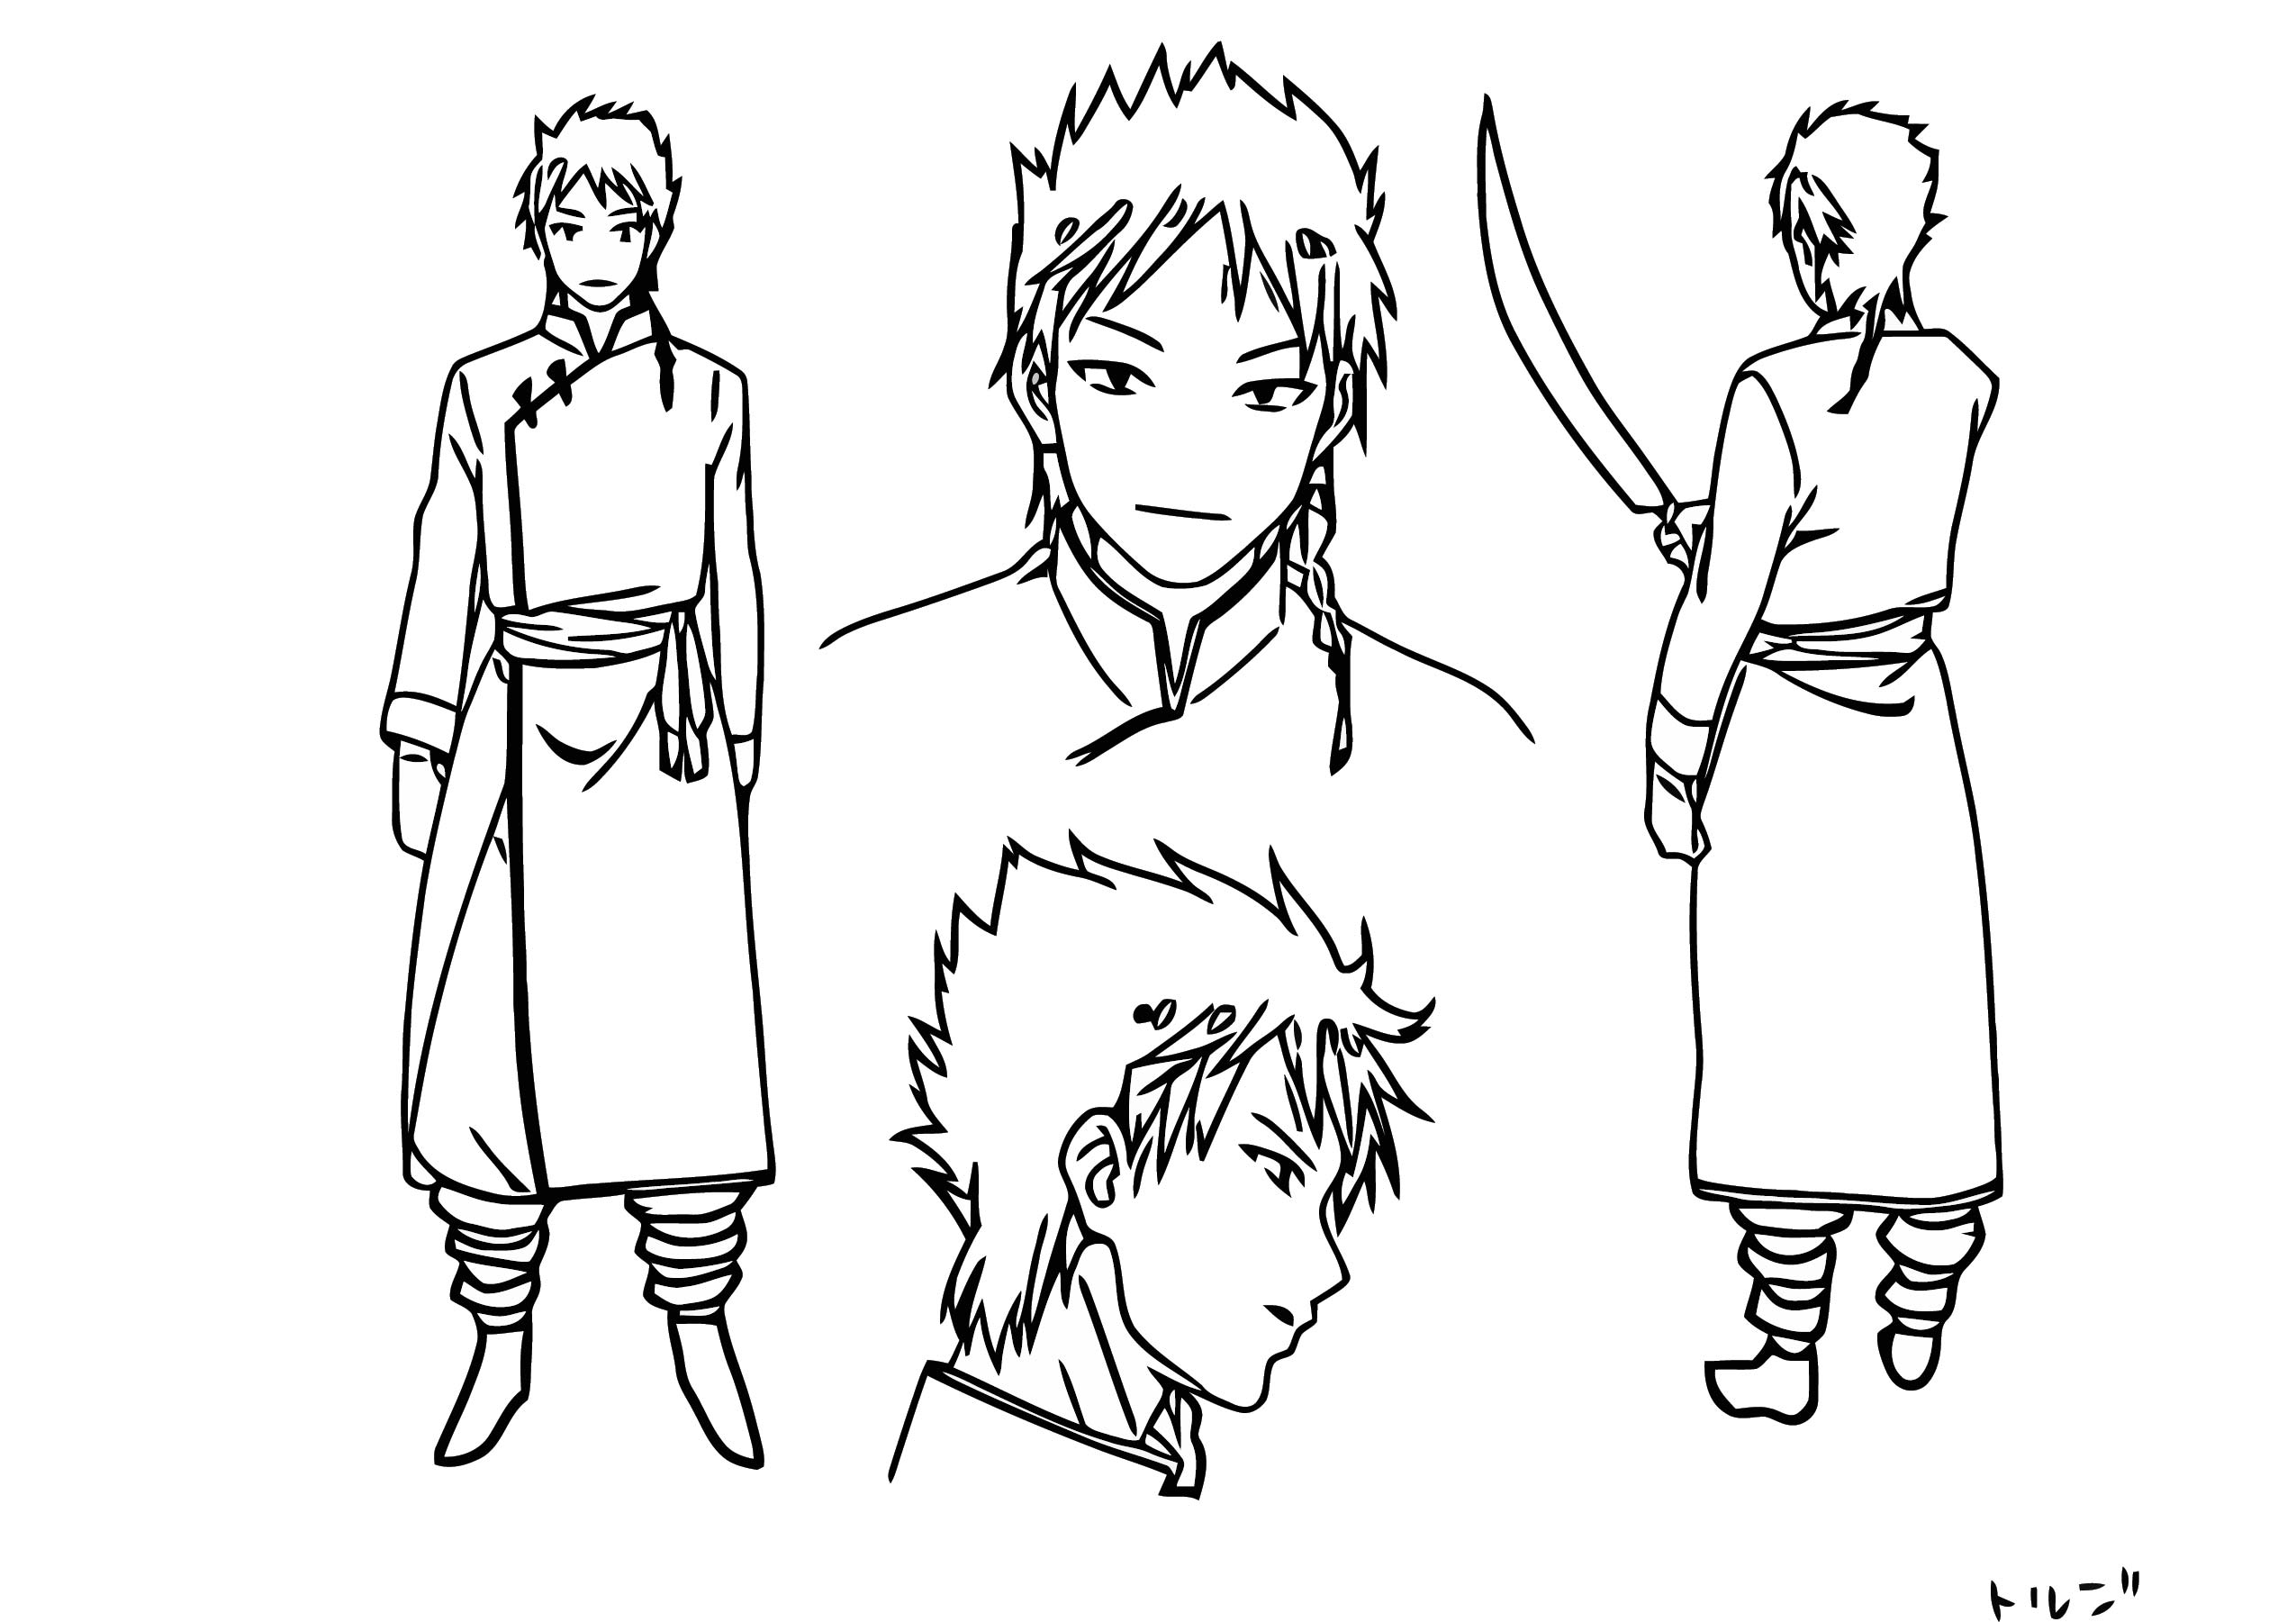 Magi Dorji Character Design Cartoon Coloring Page